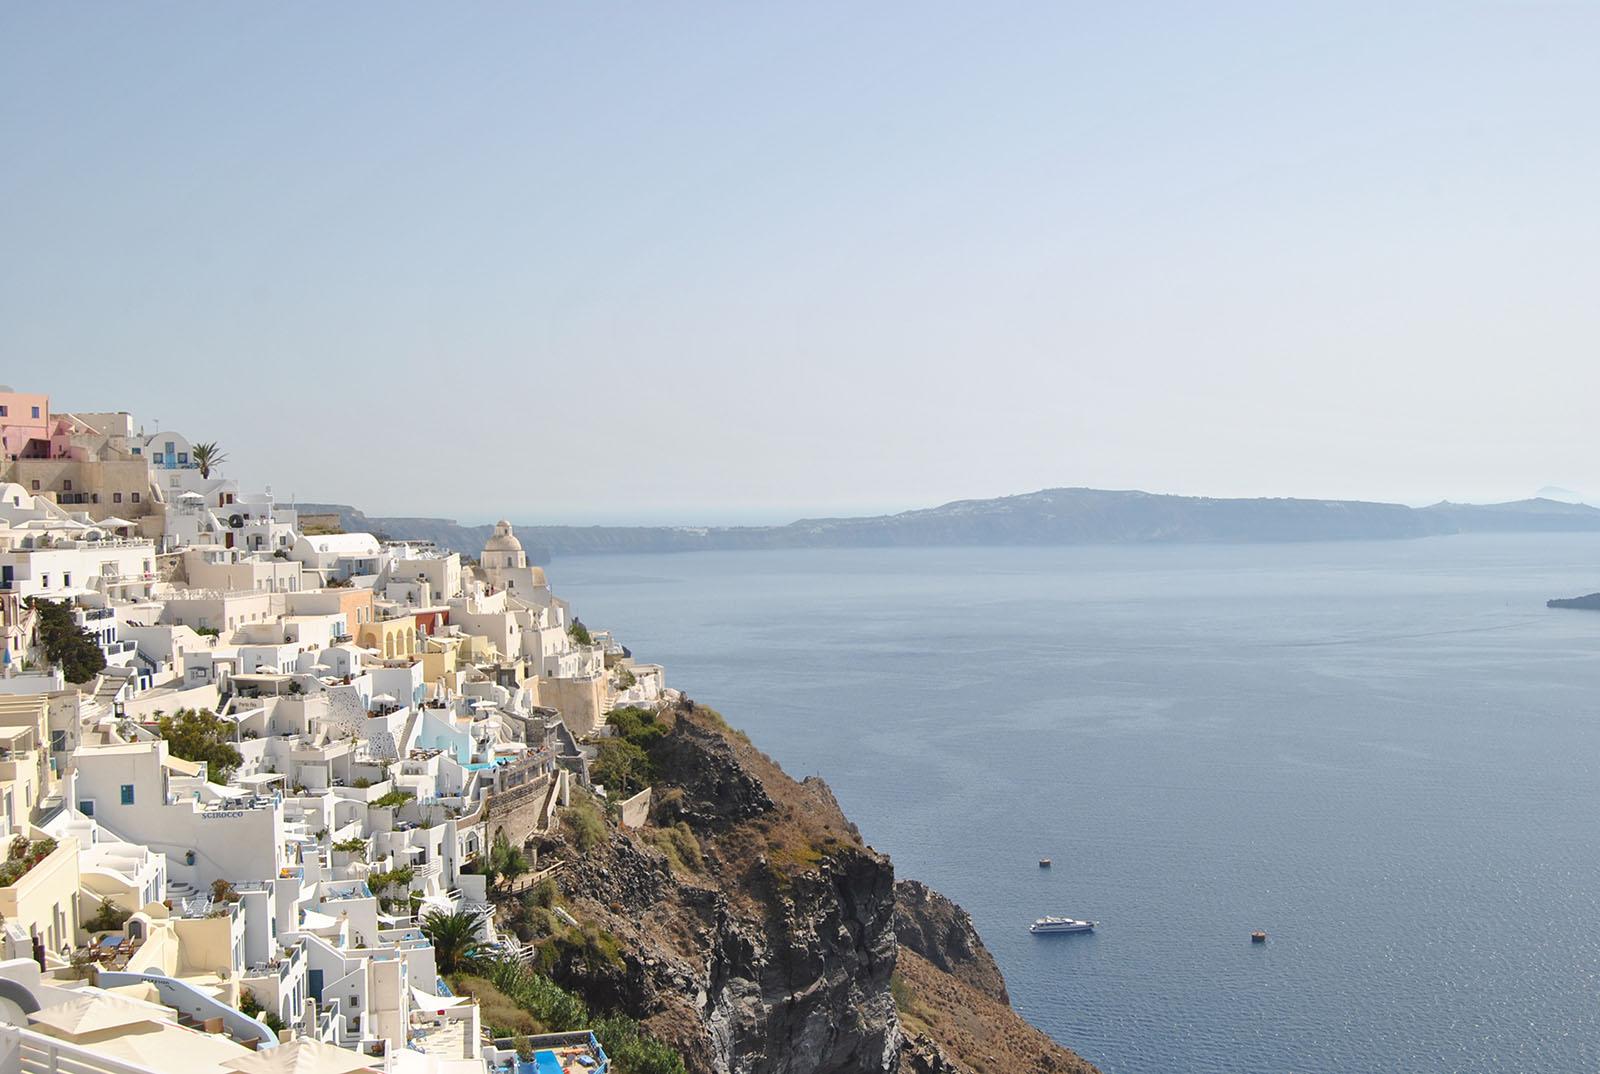 Island Hopping: A Day in Santorini